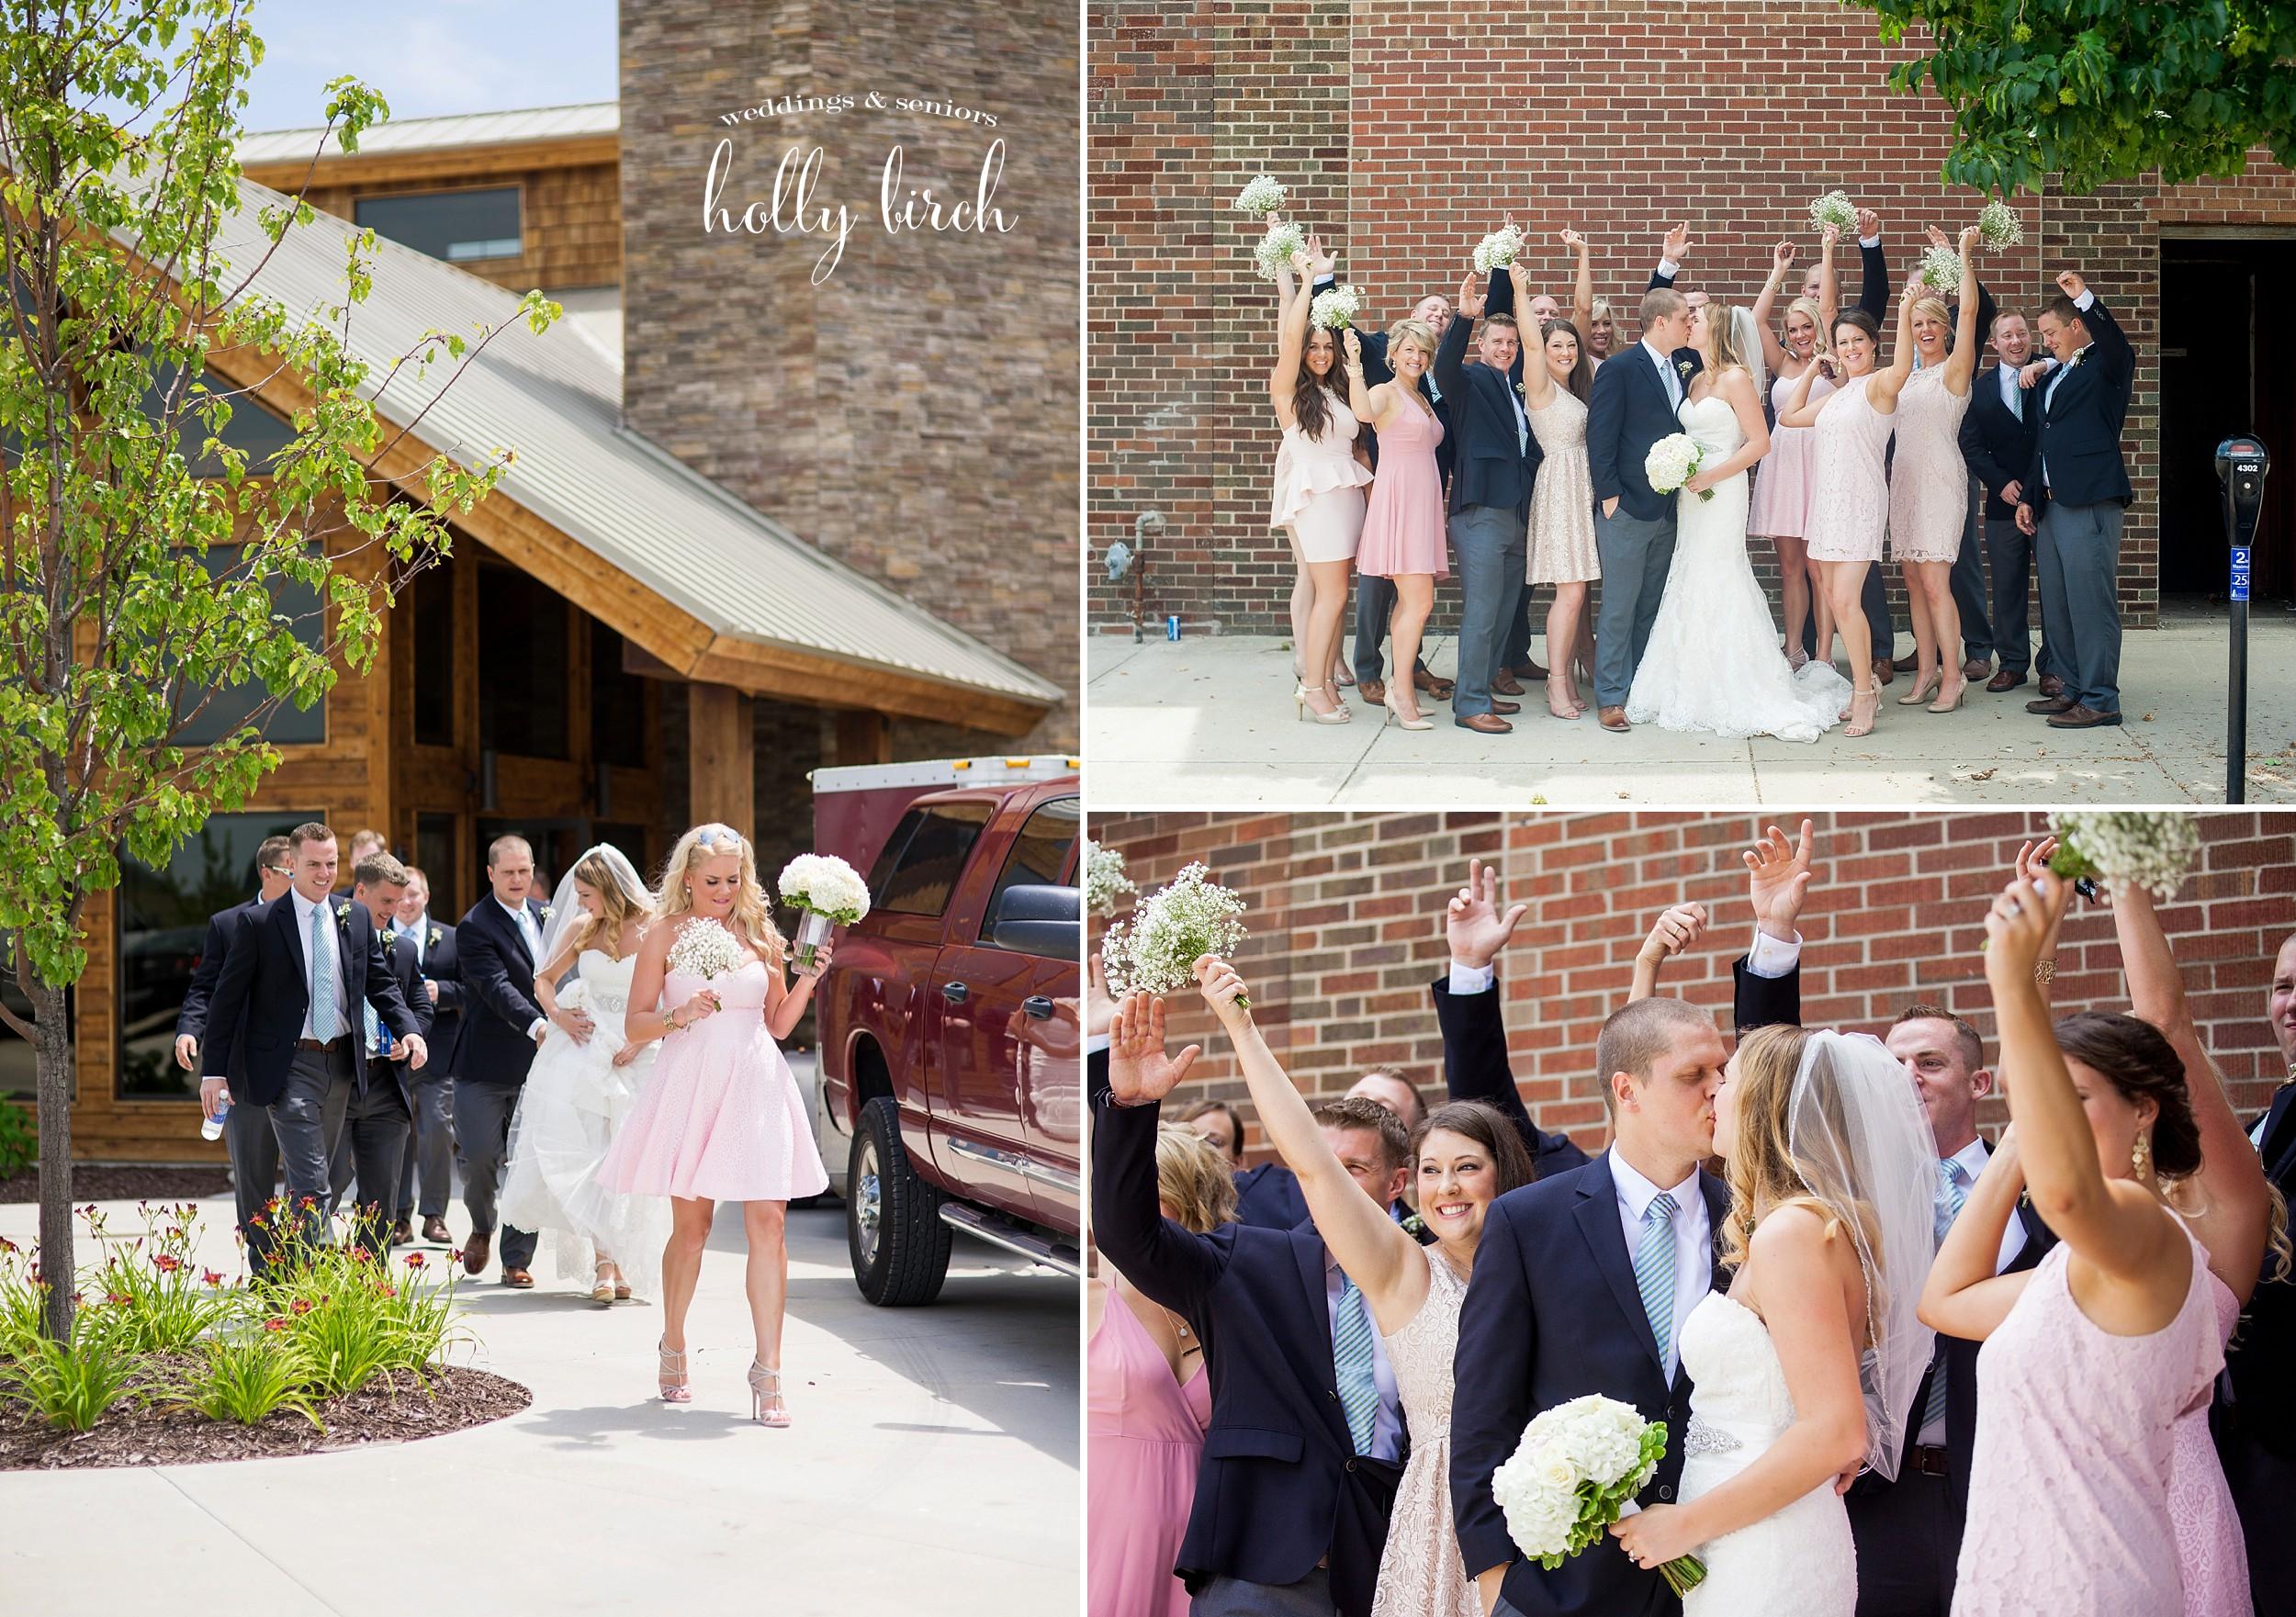 Bridal party action shots